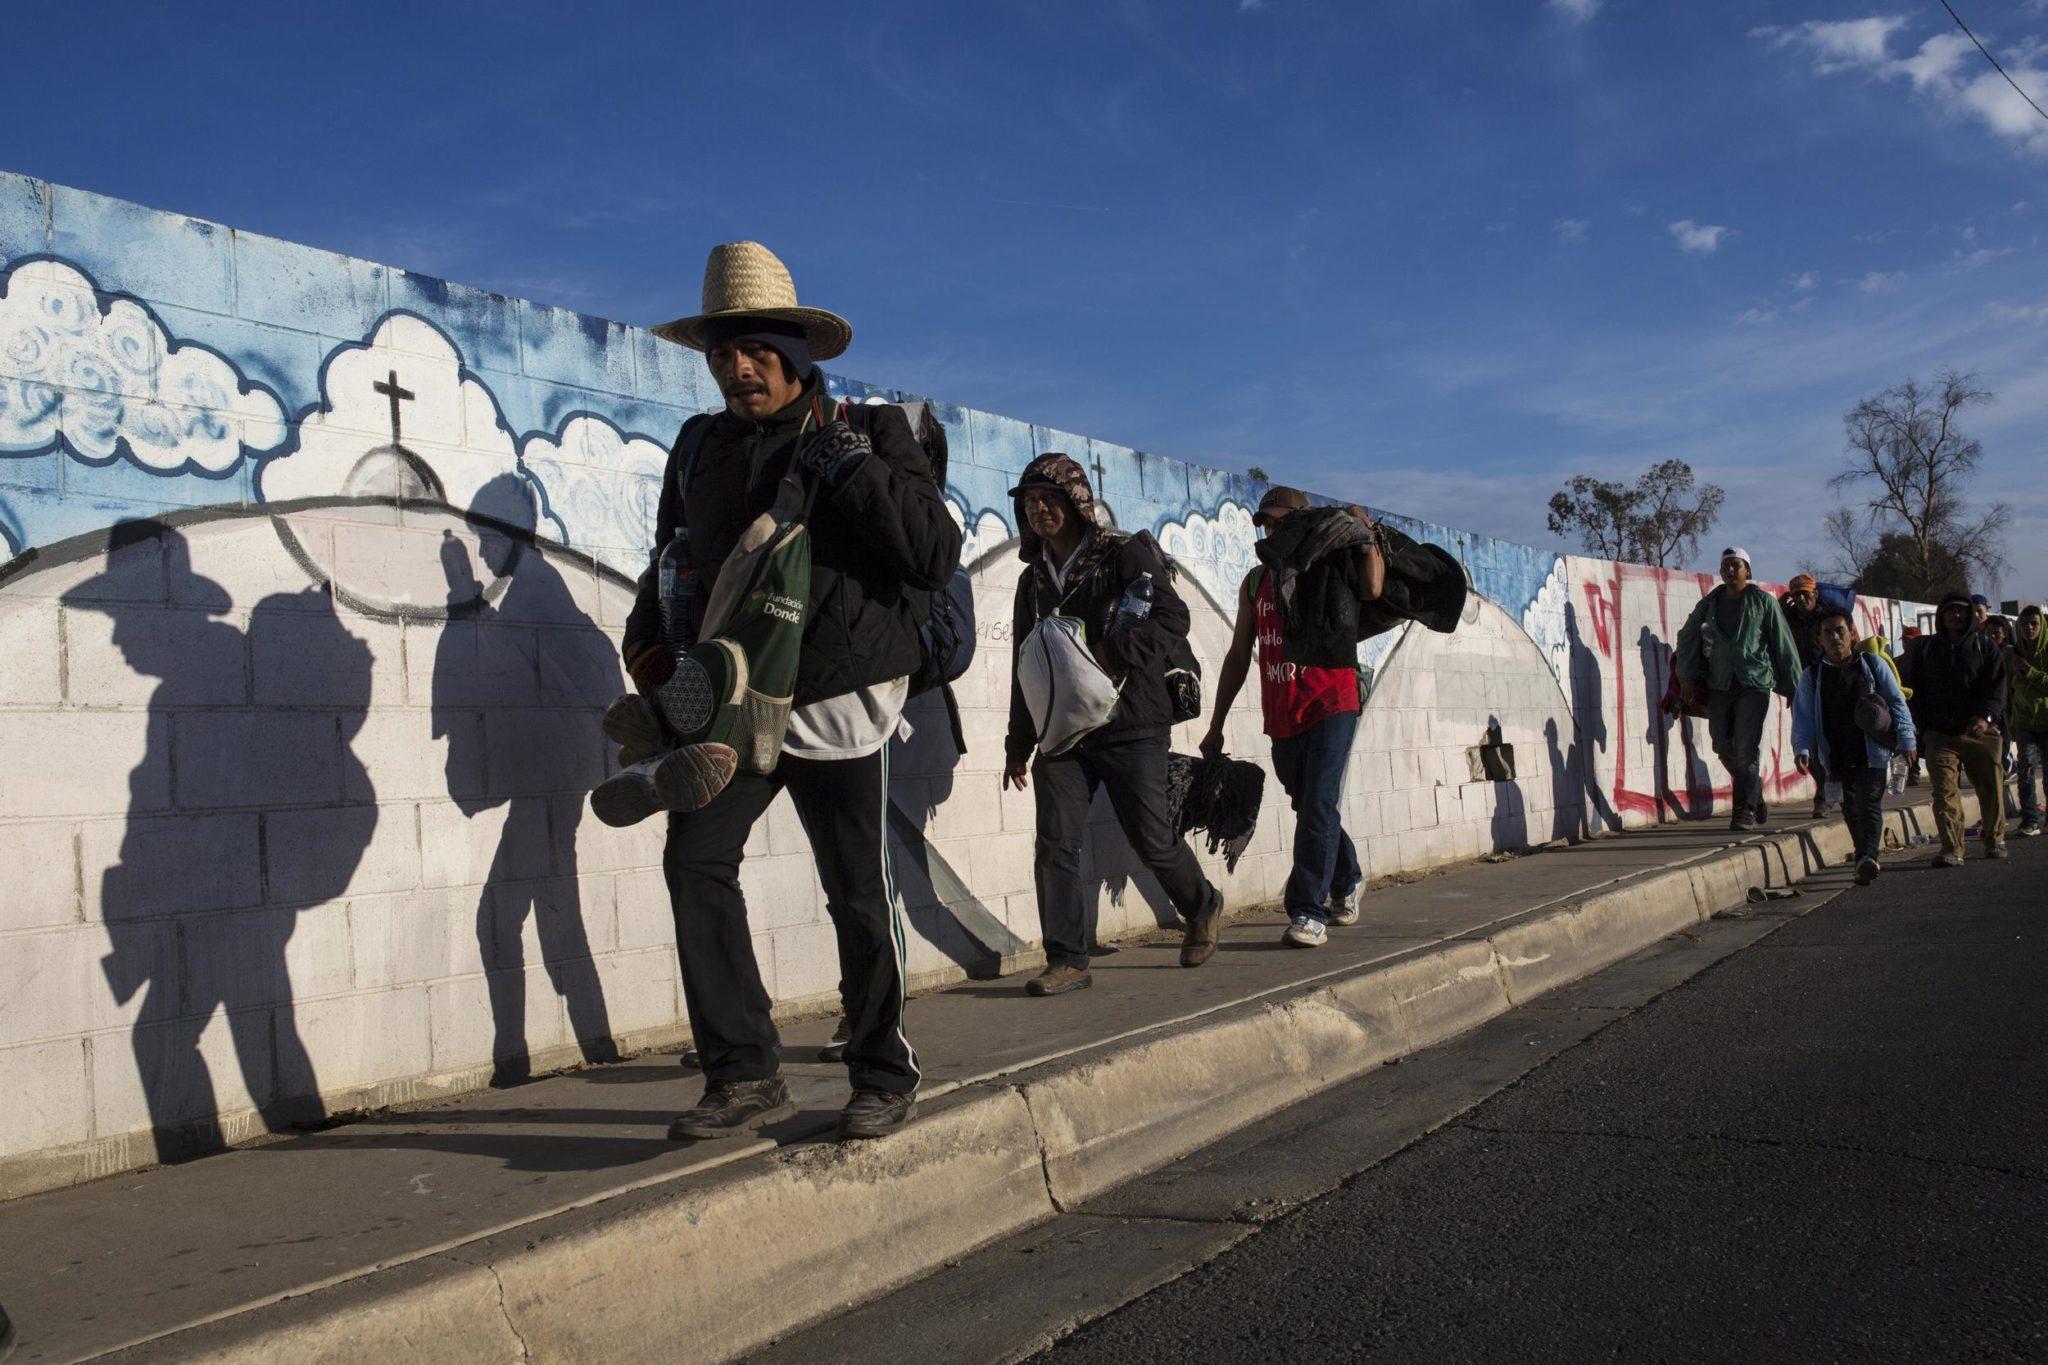 Caravan Migrants Weigh Options After Court Blocks Trump Ban